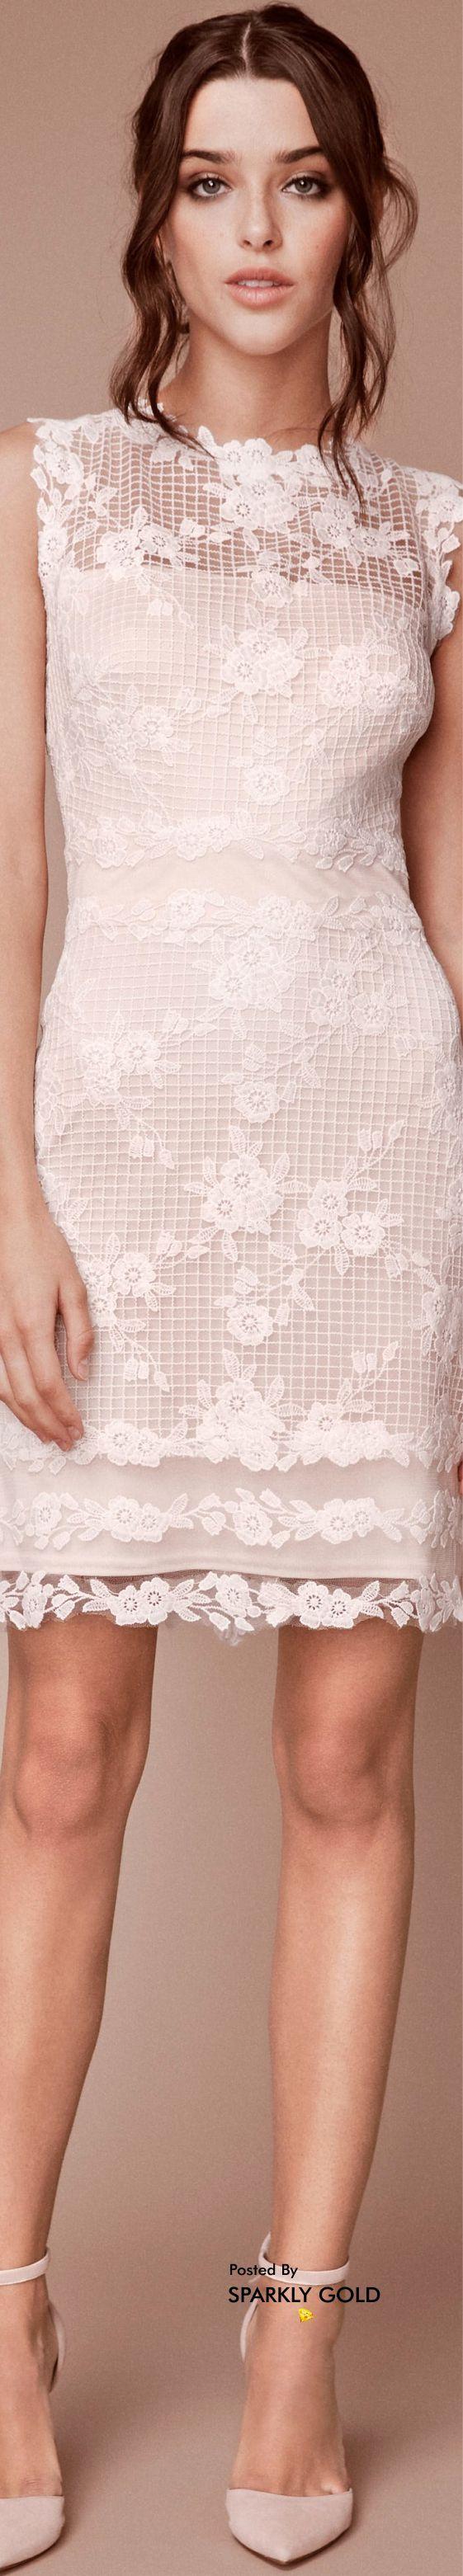 Lace dress bell sleeves june 2019 Tadashi Shoji Fall  Bridal TadashiShoji Bridal